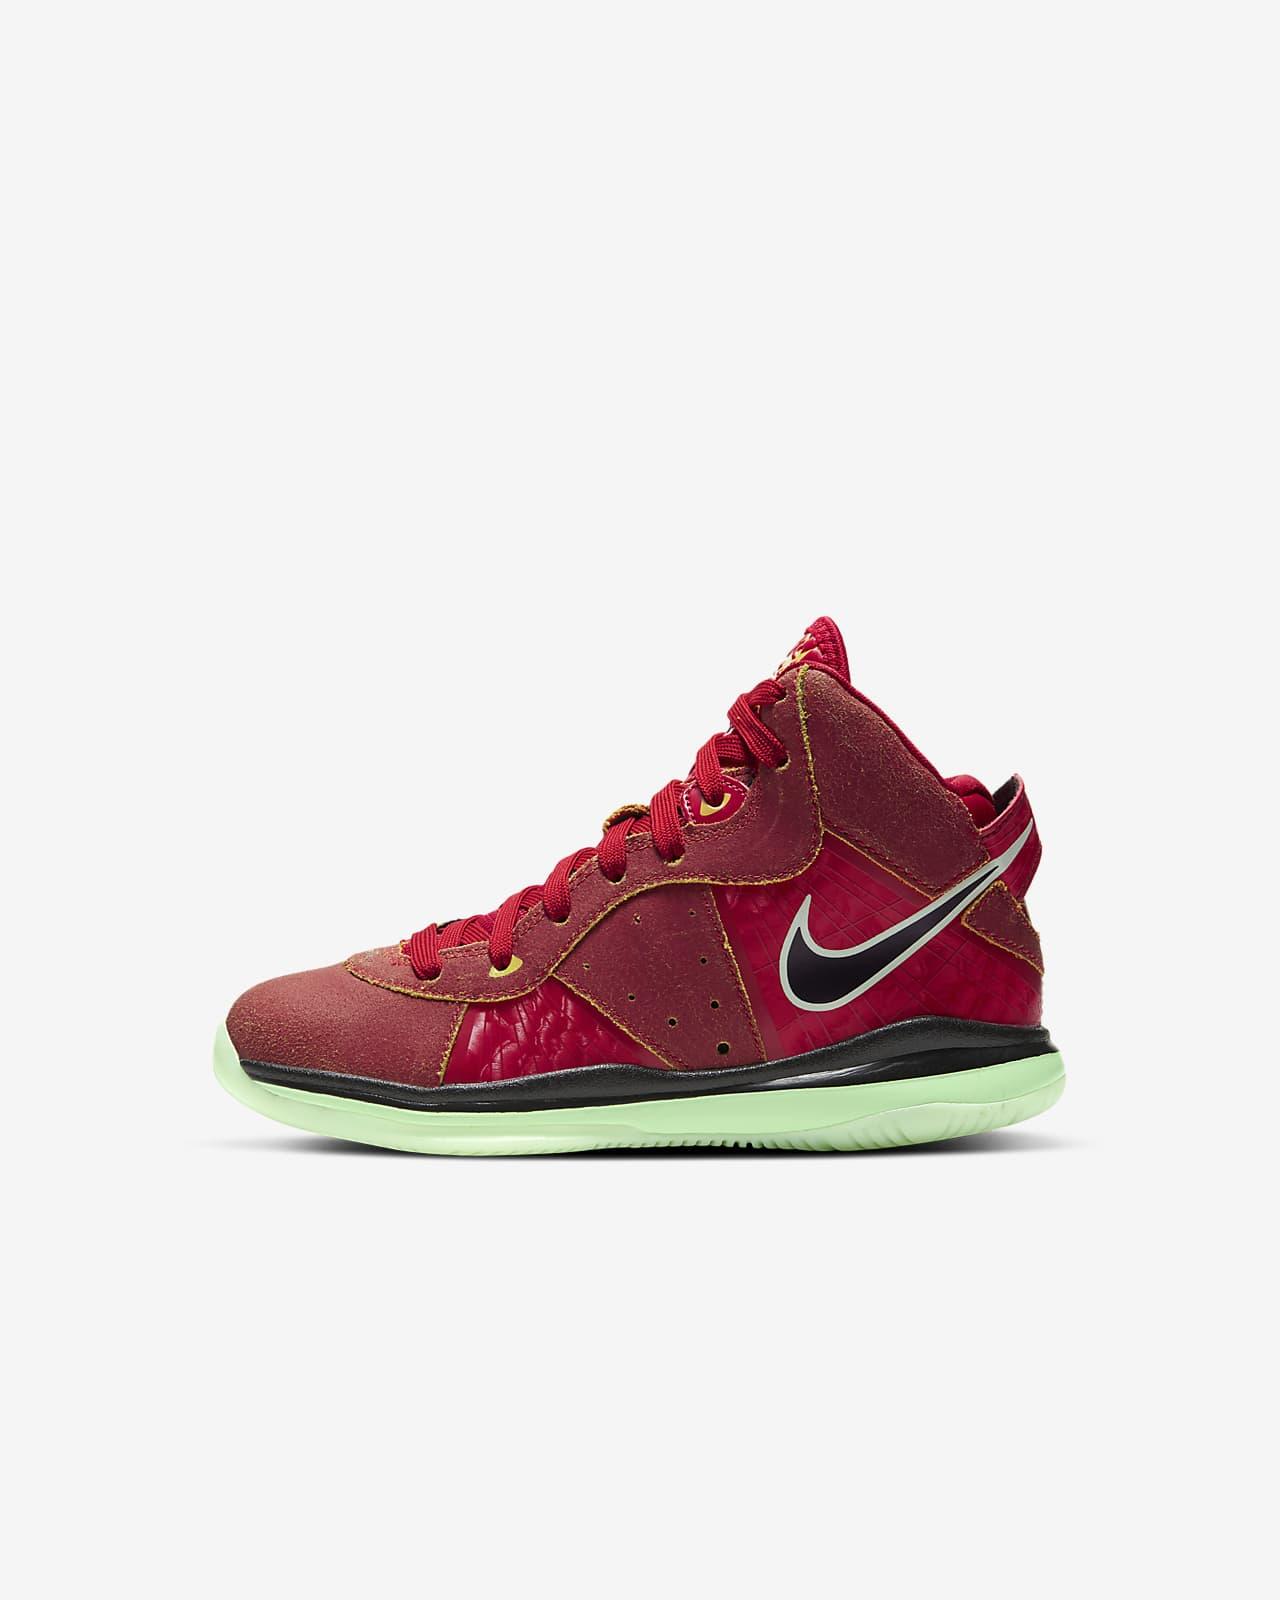 Nike LeBron VIII BP 幼童运动童鞋